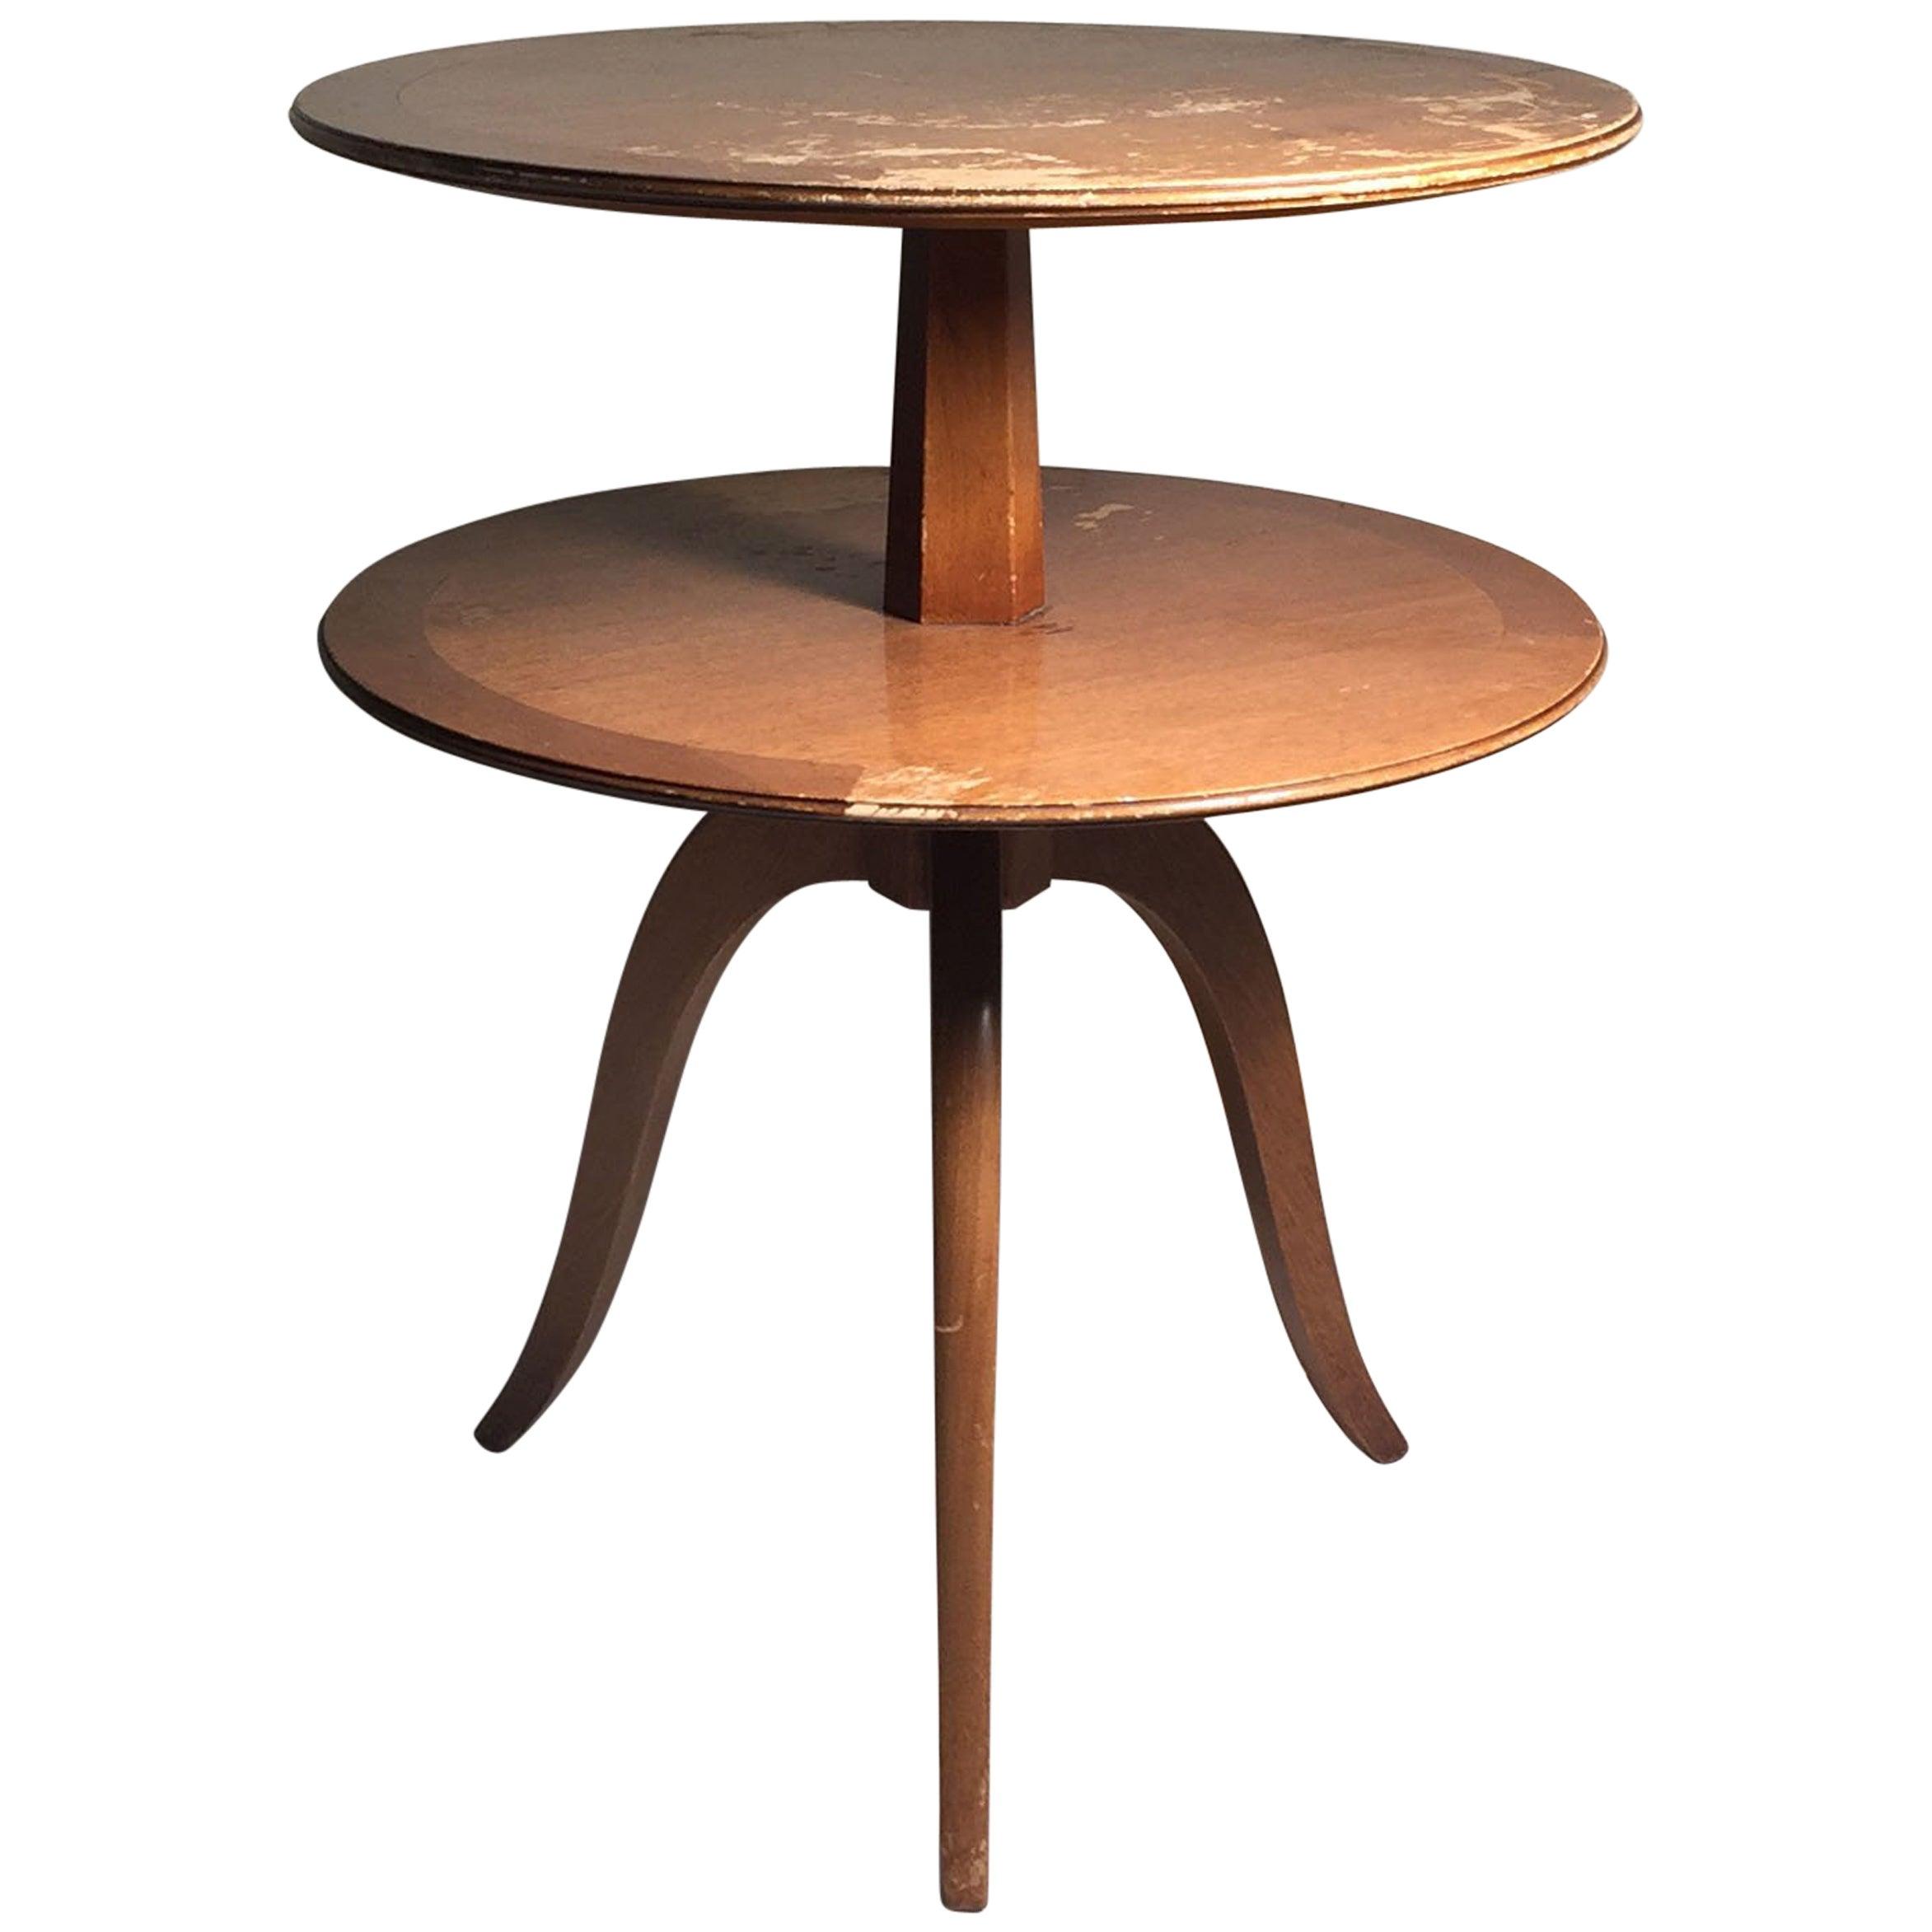 Edward Wormley Side Table for Dunbar